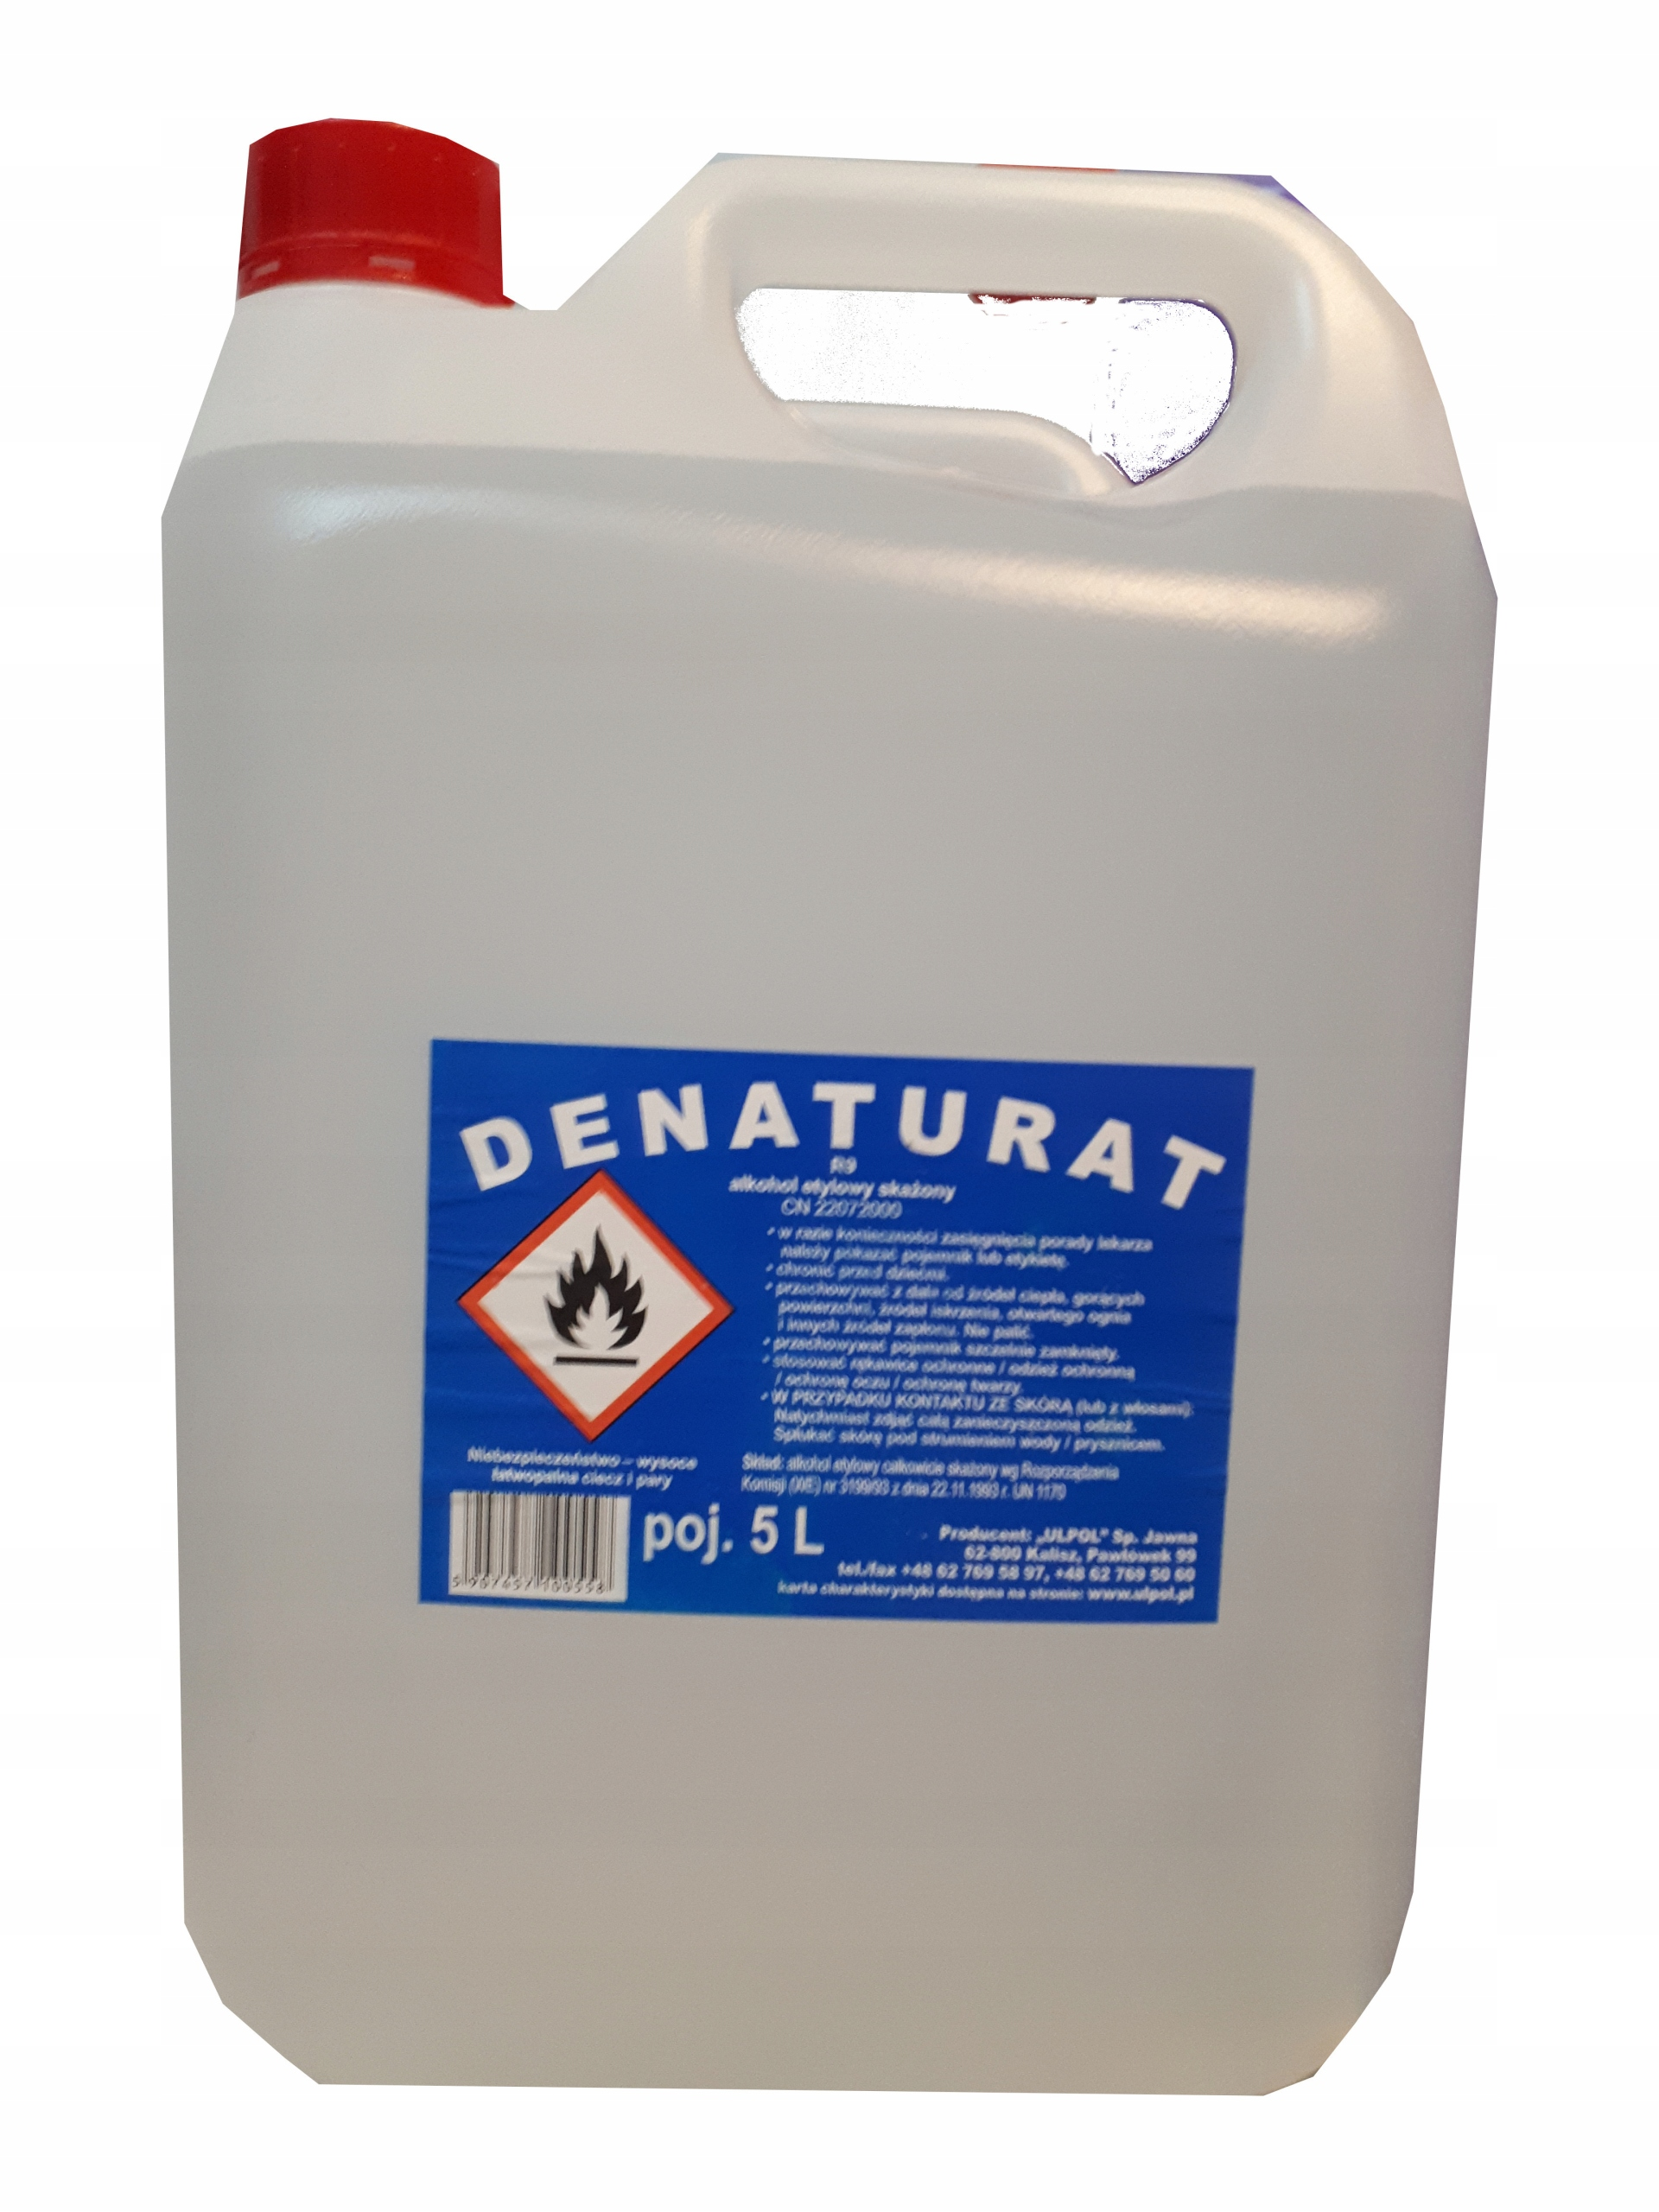 Denaturat 90% rozpuszczalnik bezbarwny/fiolet 5L!